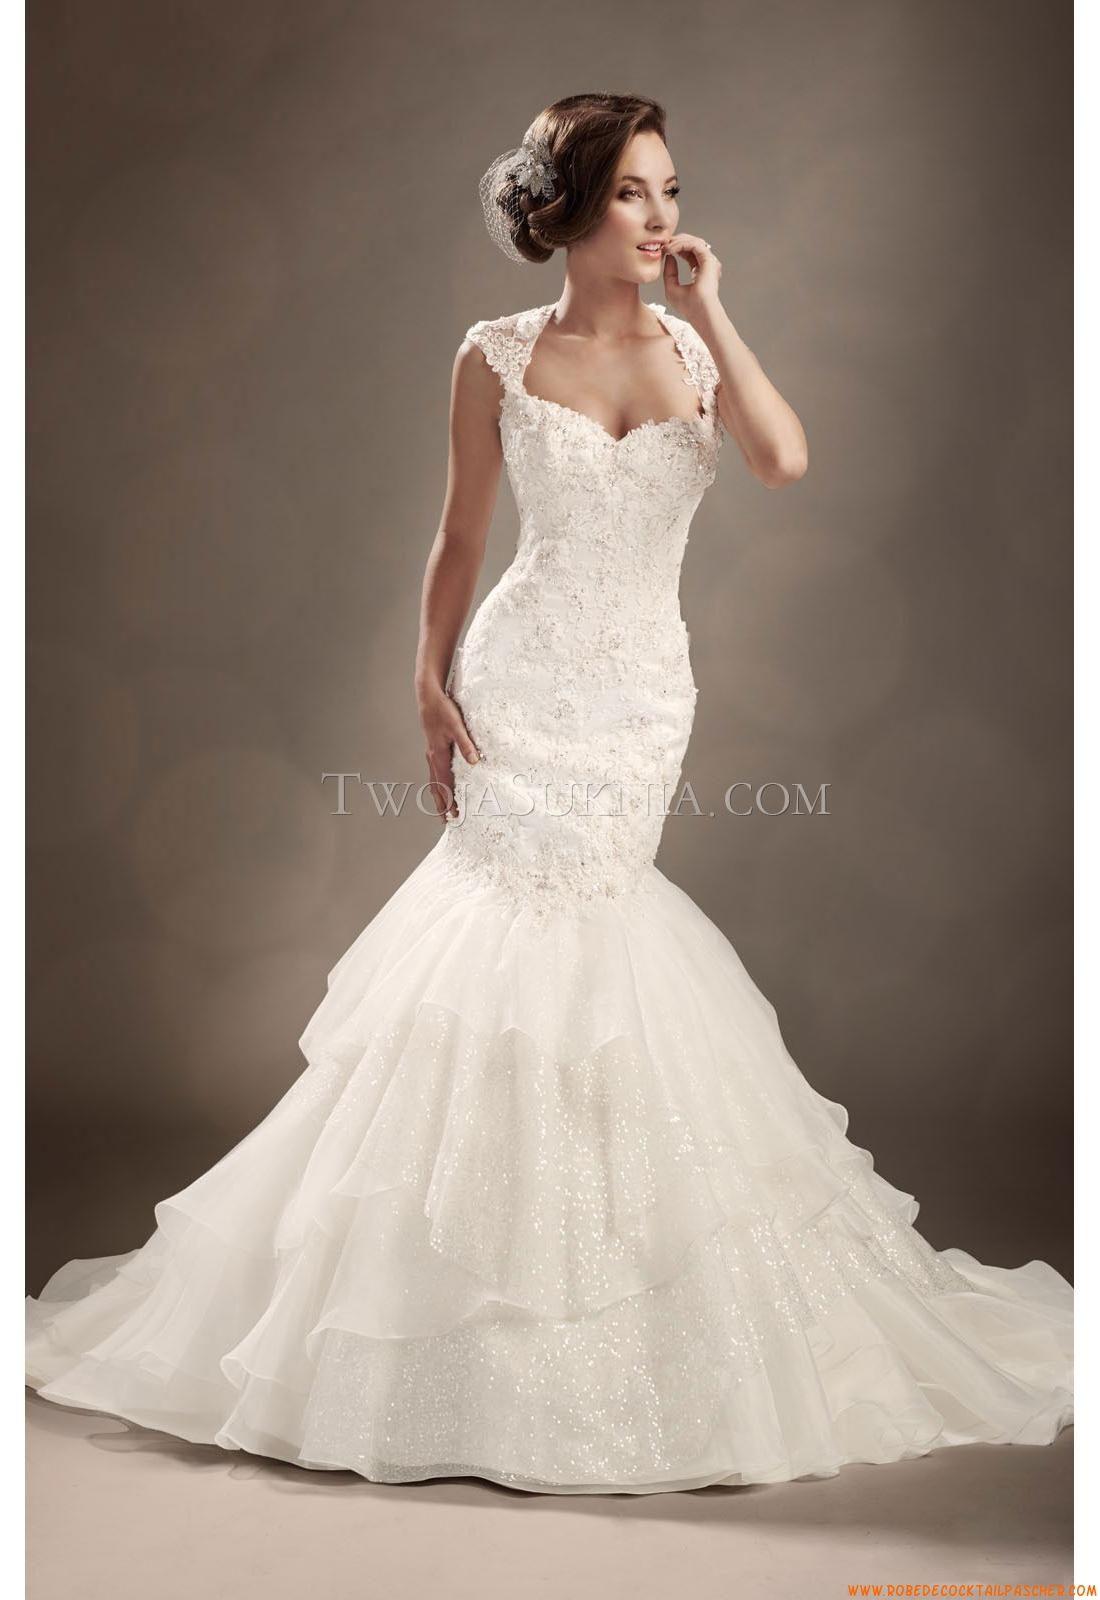 10 Robe De Mariée Sophia Tolli Ideas Sophia Tolli Wedding Dresses Bridal Gowns Designer Wedding Dresses